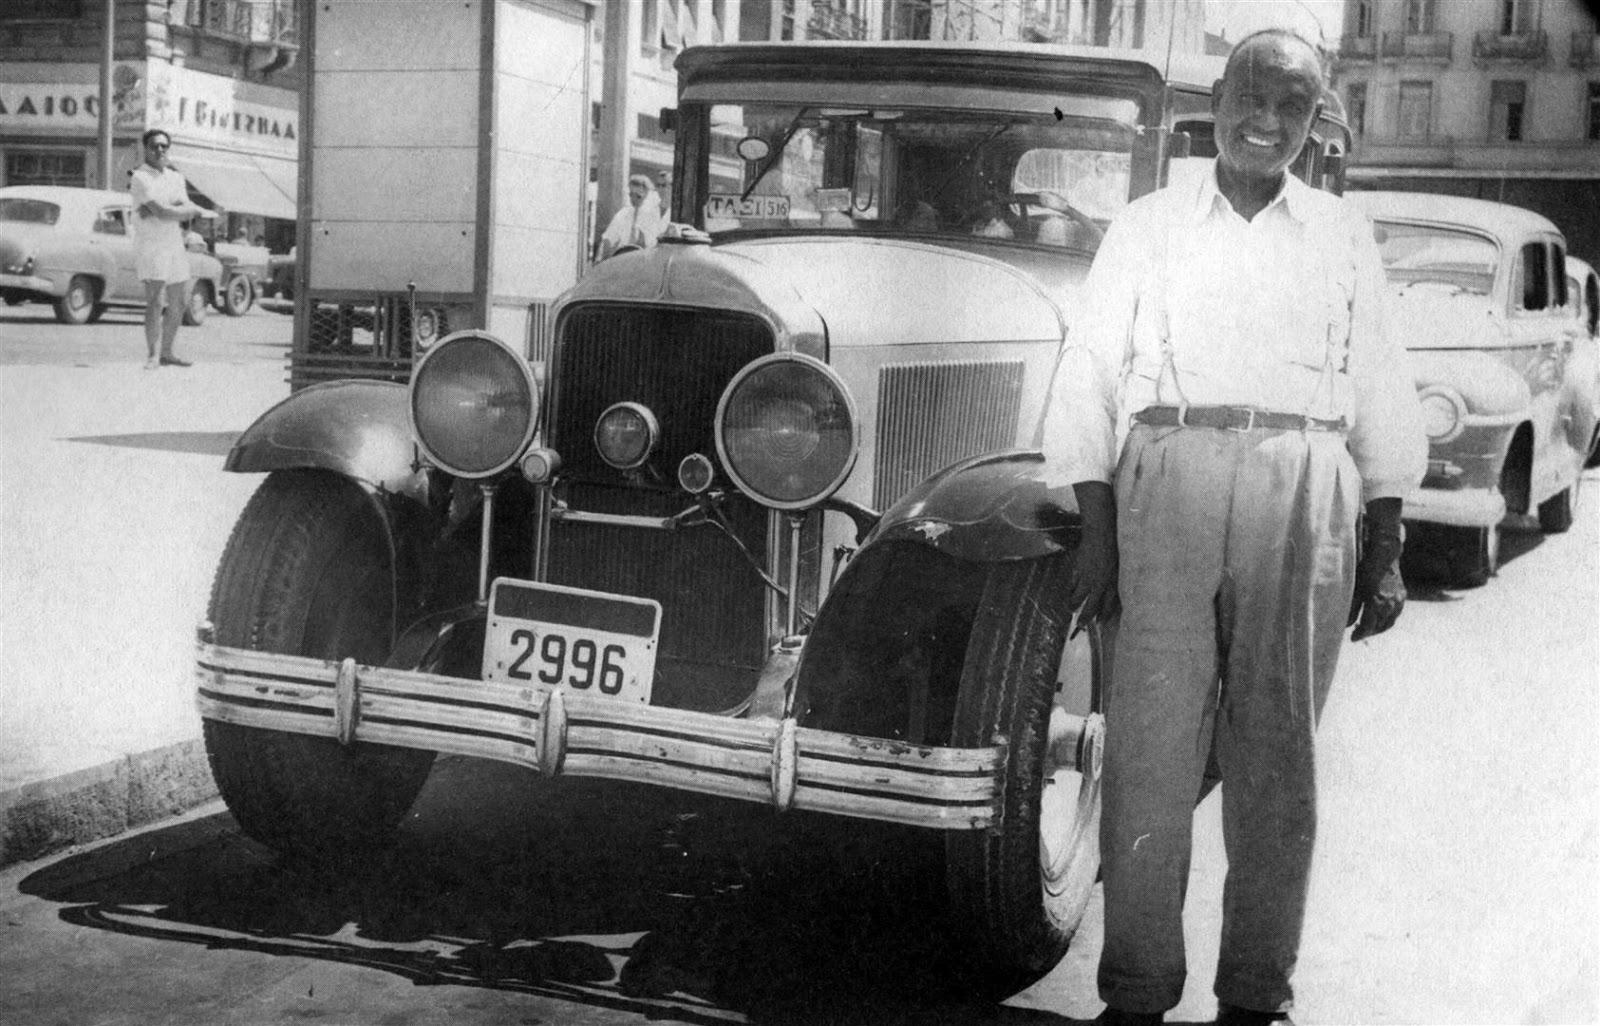 http://3.bp.blogspot.com/-0vOVPGrLkyA/UY5BQJ8D9PI/AAAAAAAAIas/ceTIUngCl_0/s1600/Athens+Kaythmonos+1959+Taxis.jpg